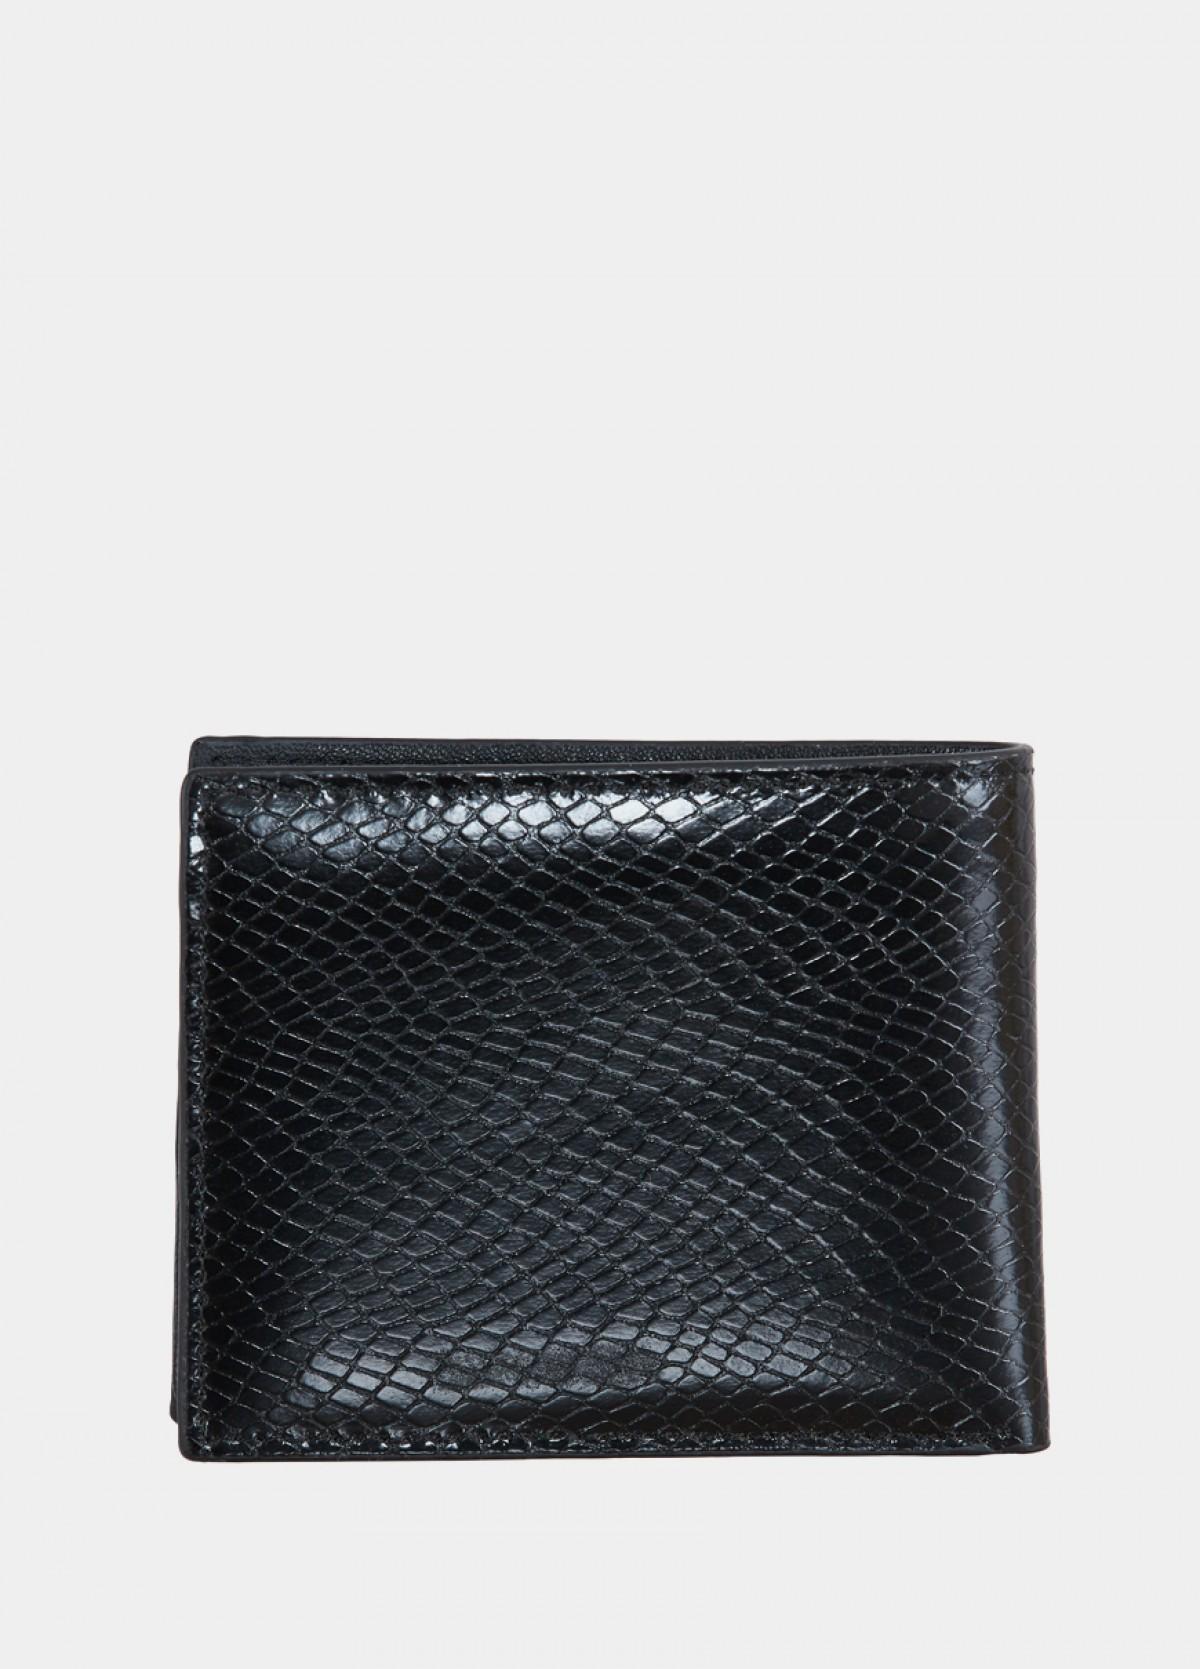 The Black Leather Men Wallet